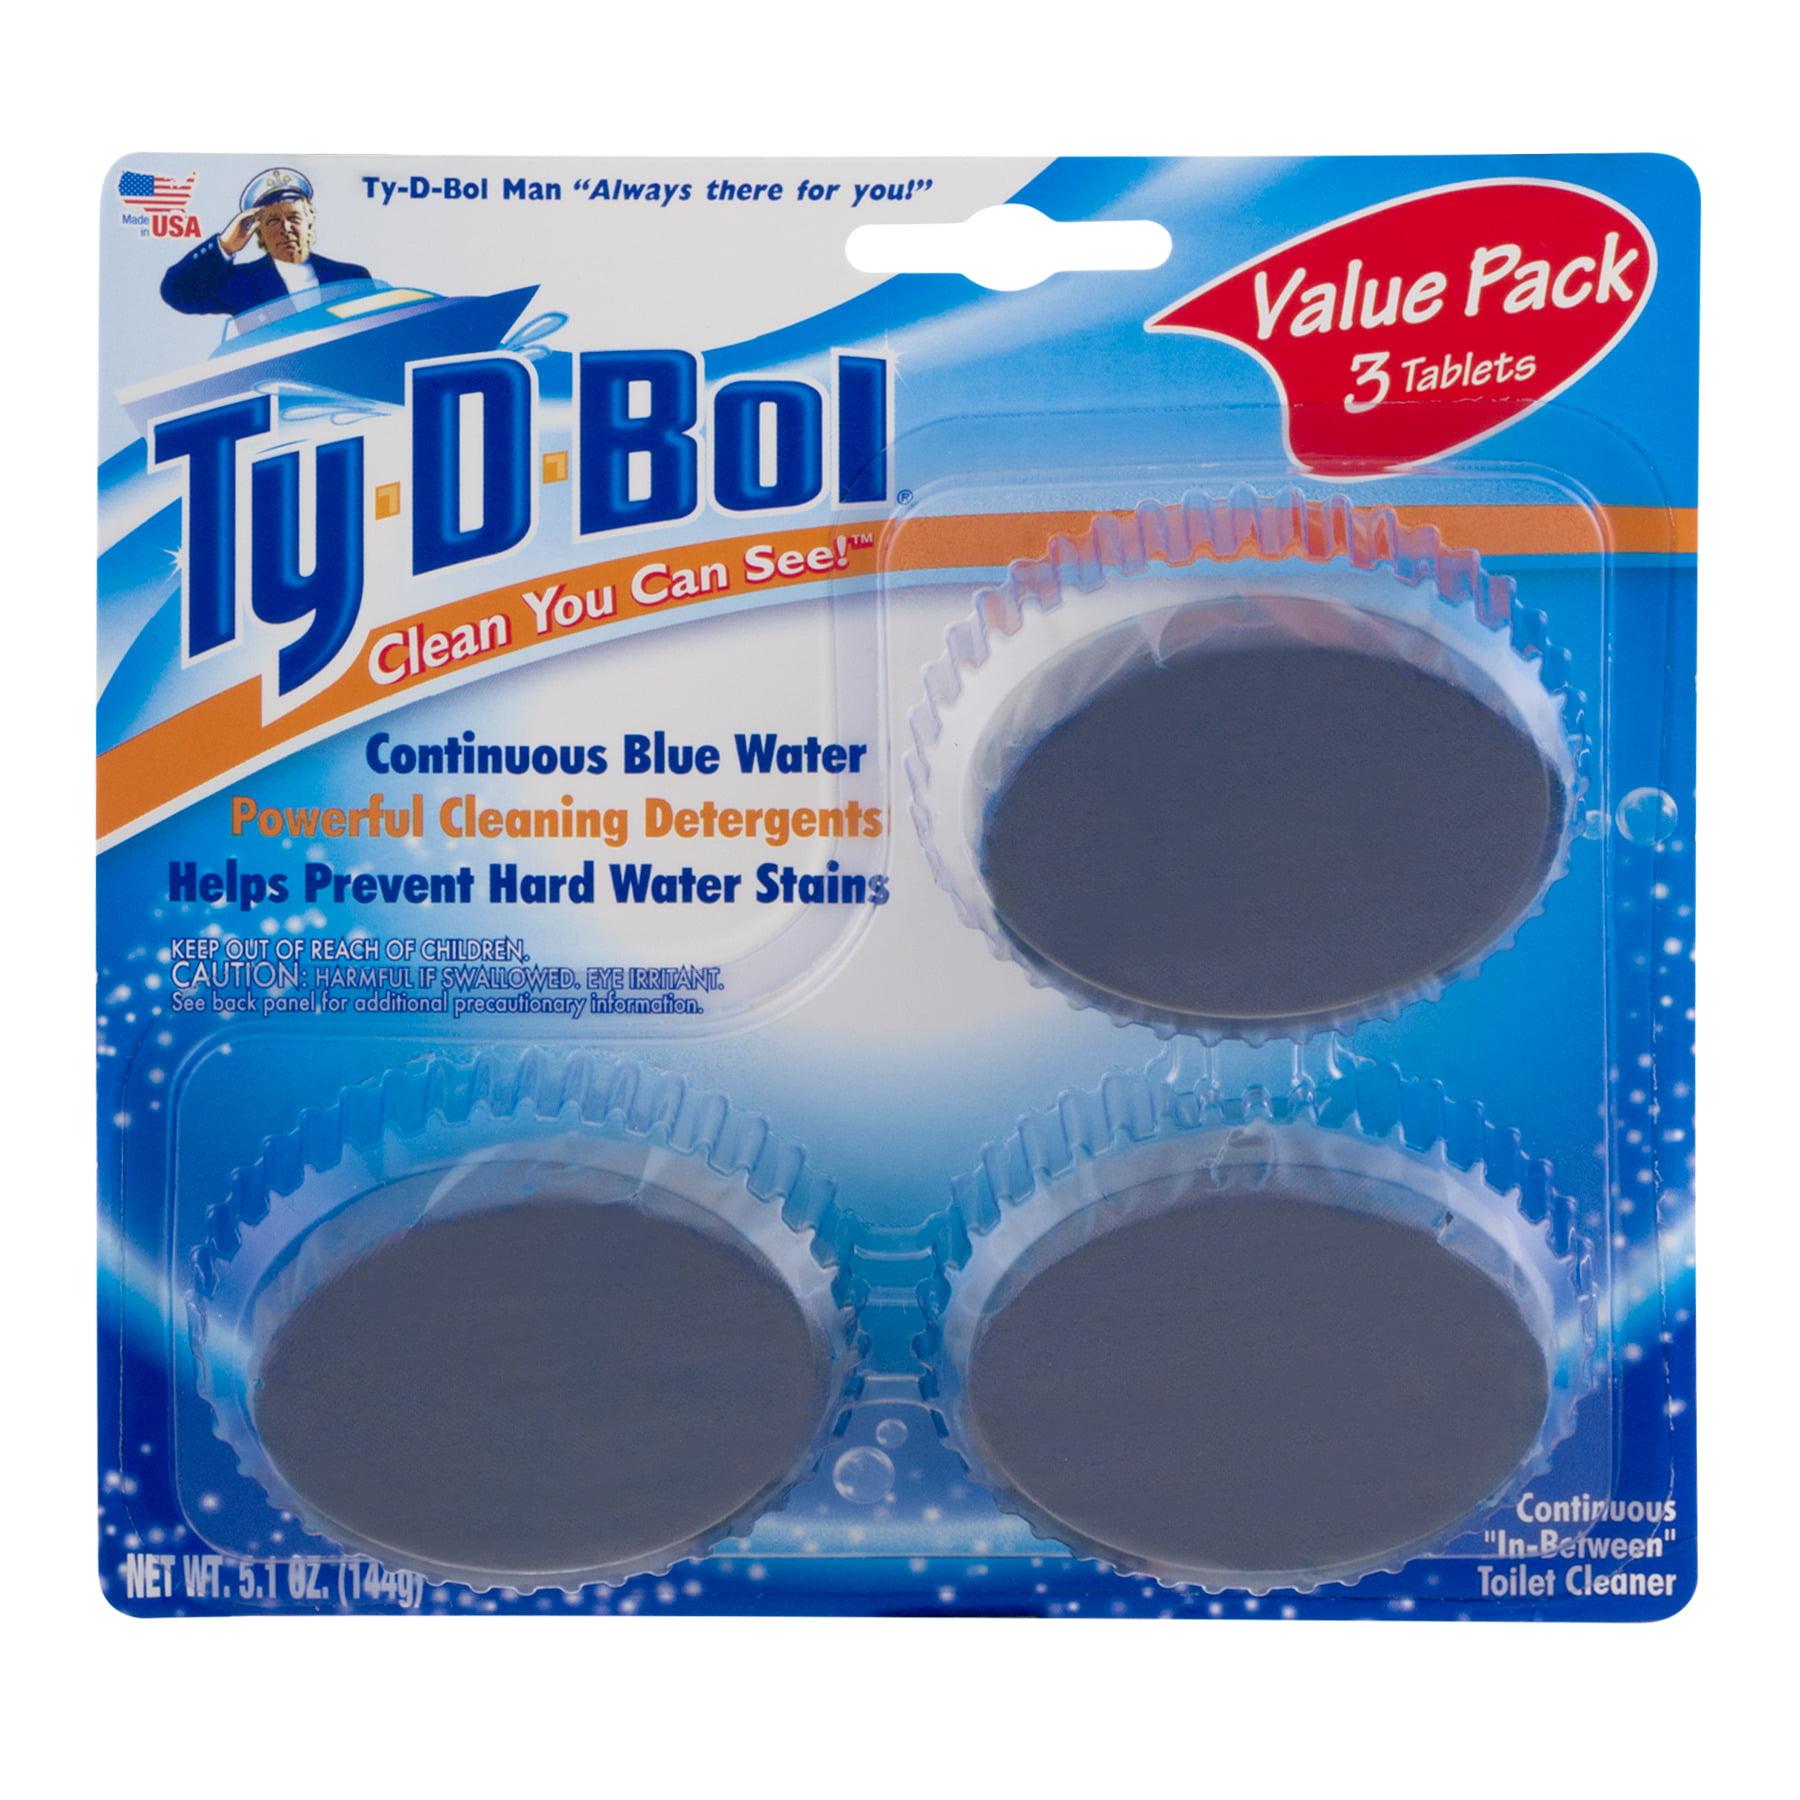 (3 pack) Ty-D-Bol Blue Toilet Bowl 1.7 oz Cleaner Tablets, 3-Pack